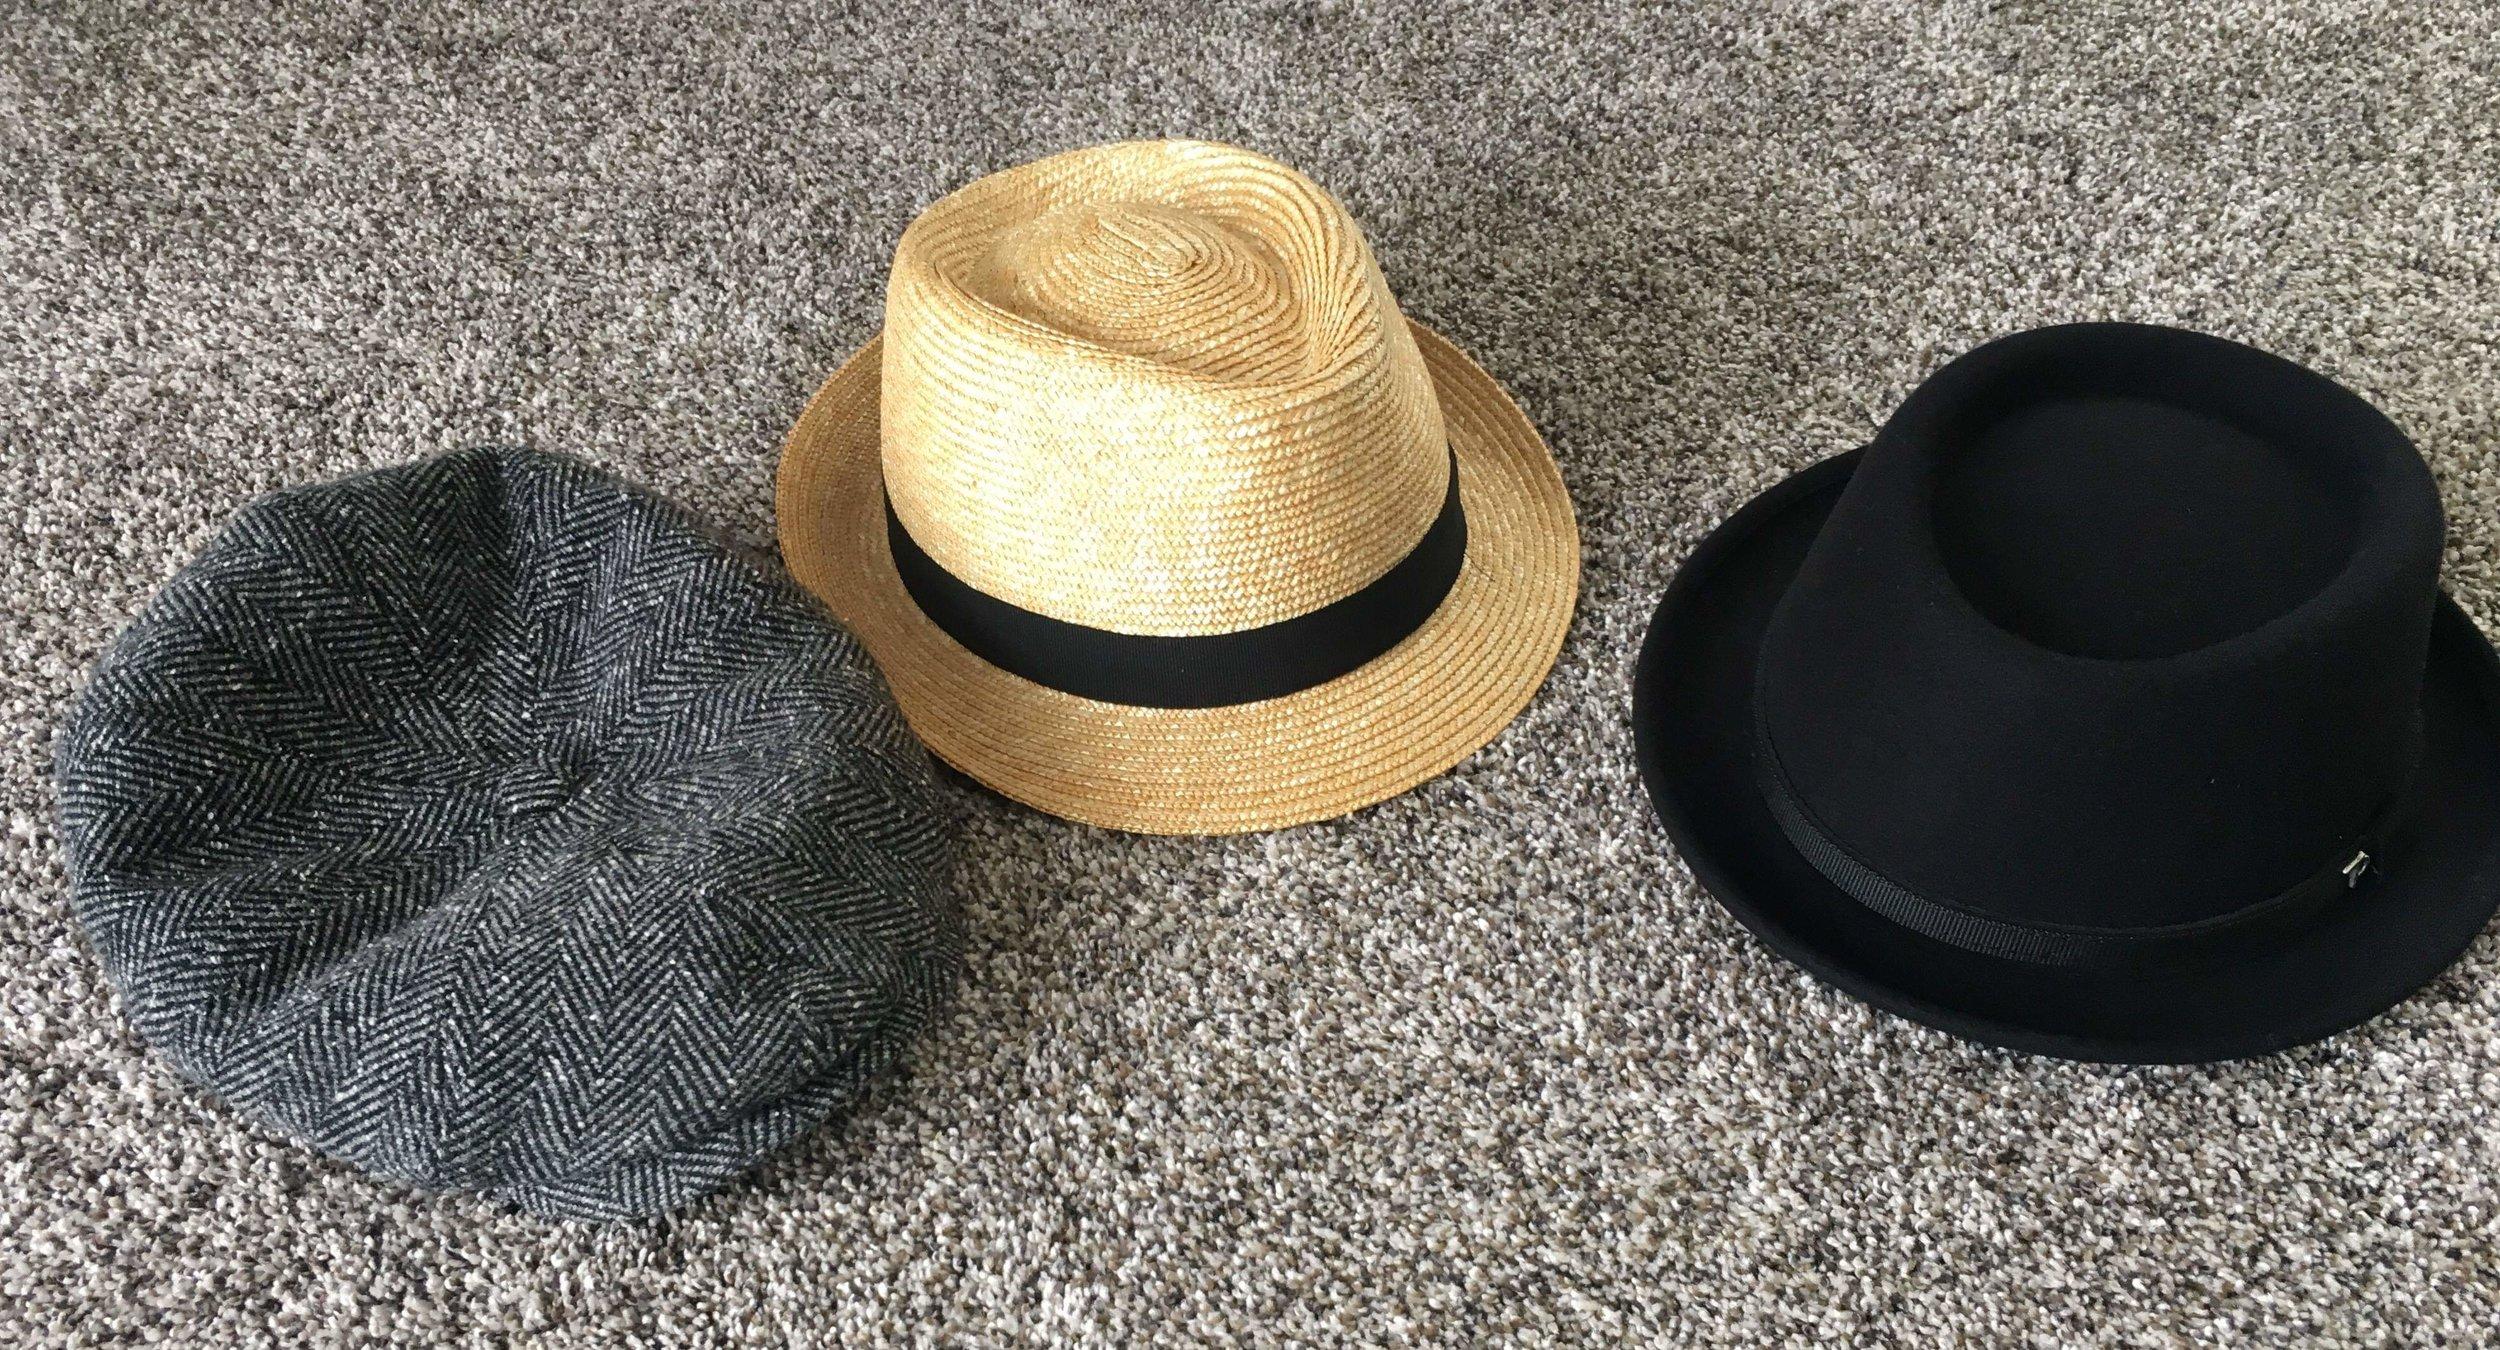 Goldilocks and the three hats...